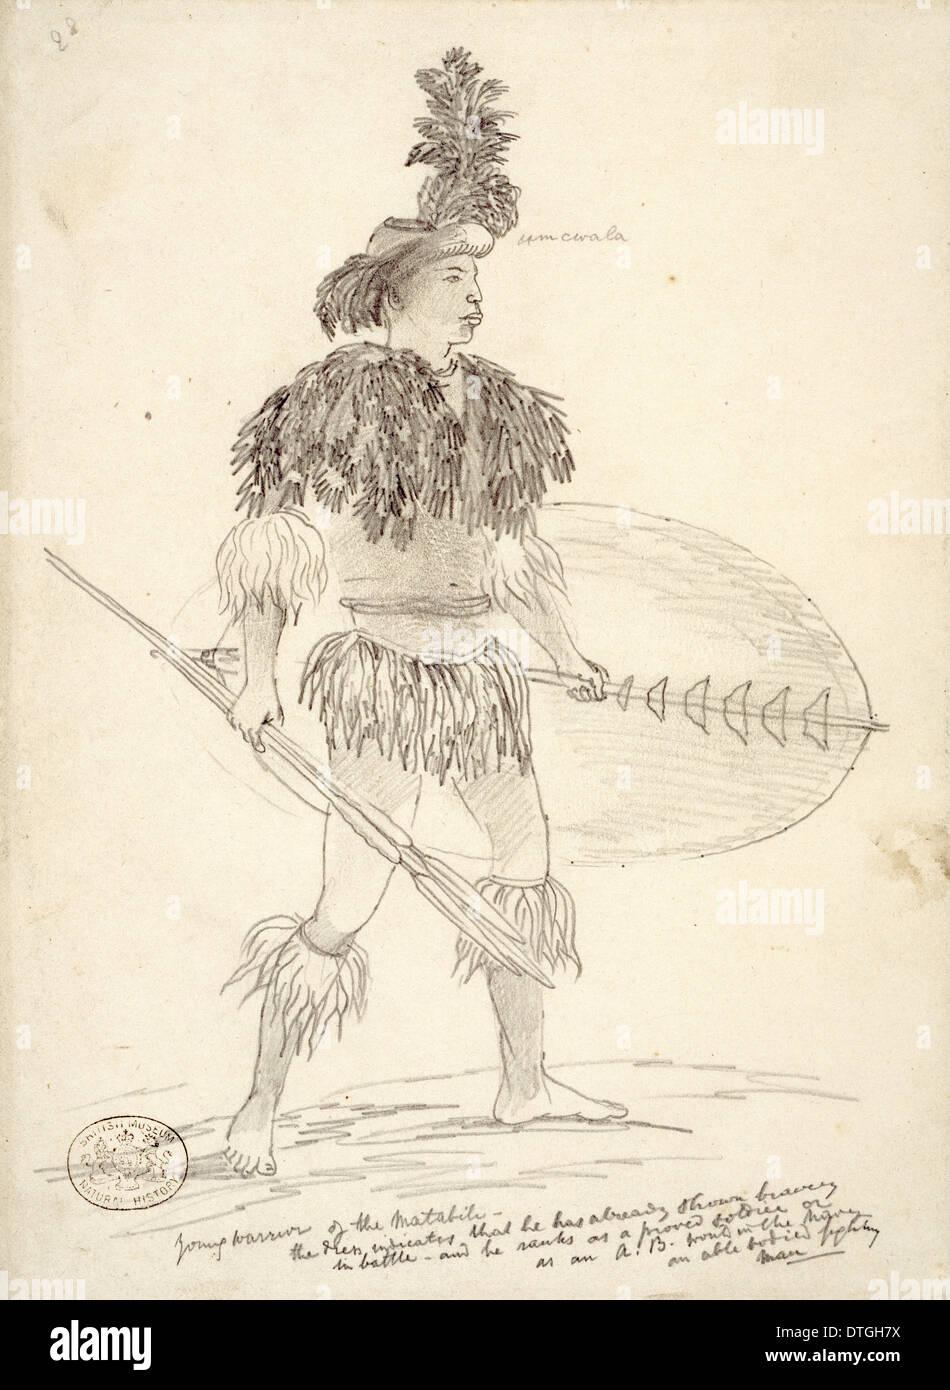 Young Matabili Krieger 1870-1871 Stockbild